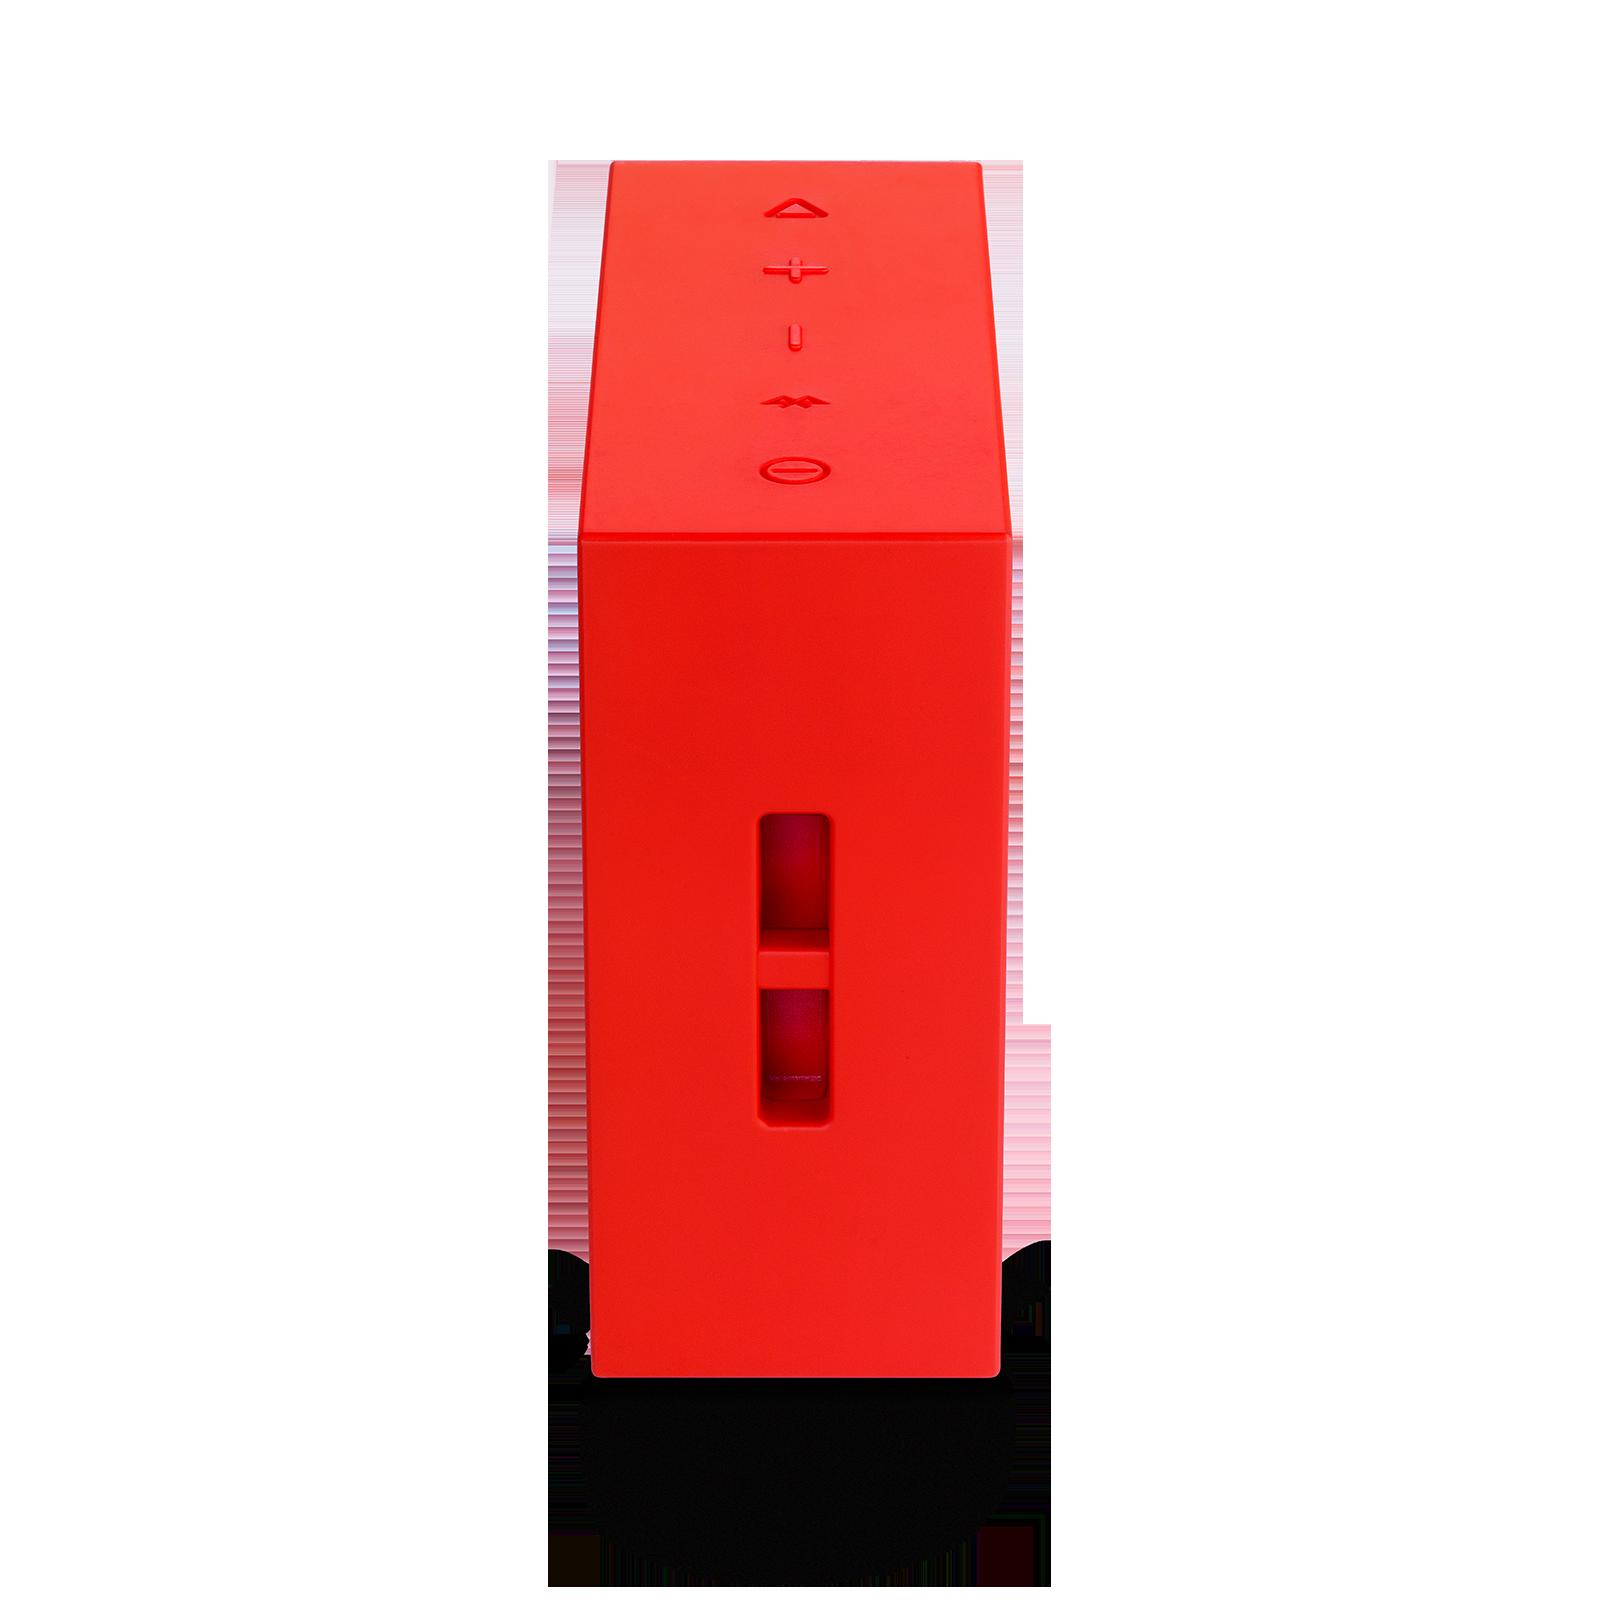 JBL GO+ - Red - Portable Bluetooth® Speaker - Detailshot 1